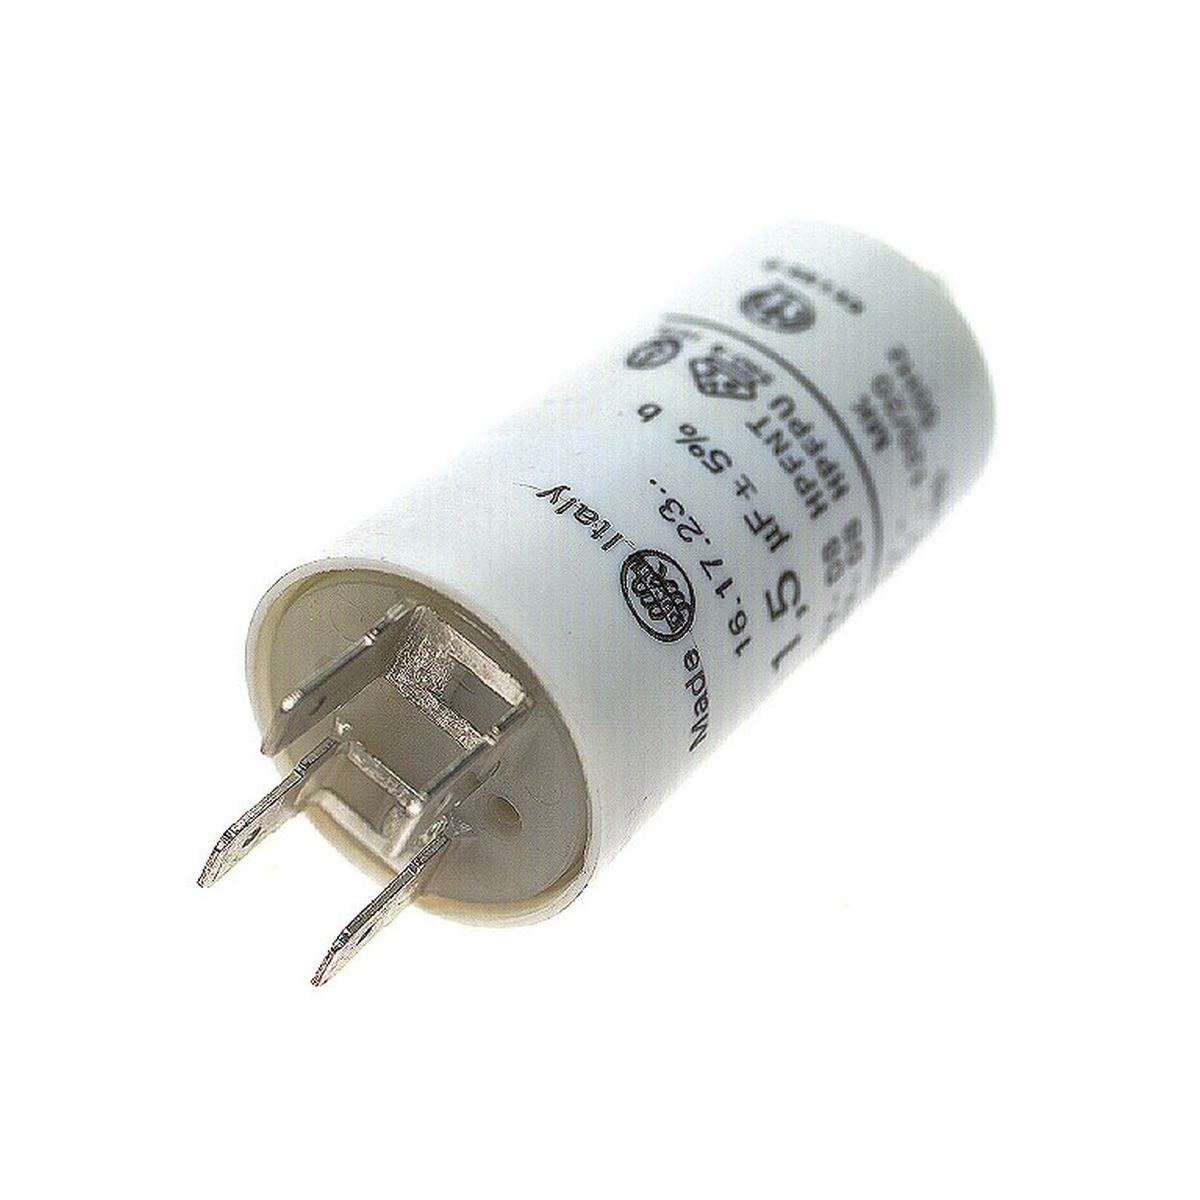 Kondensator 5,0 µF 450V